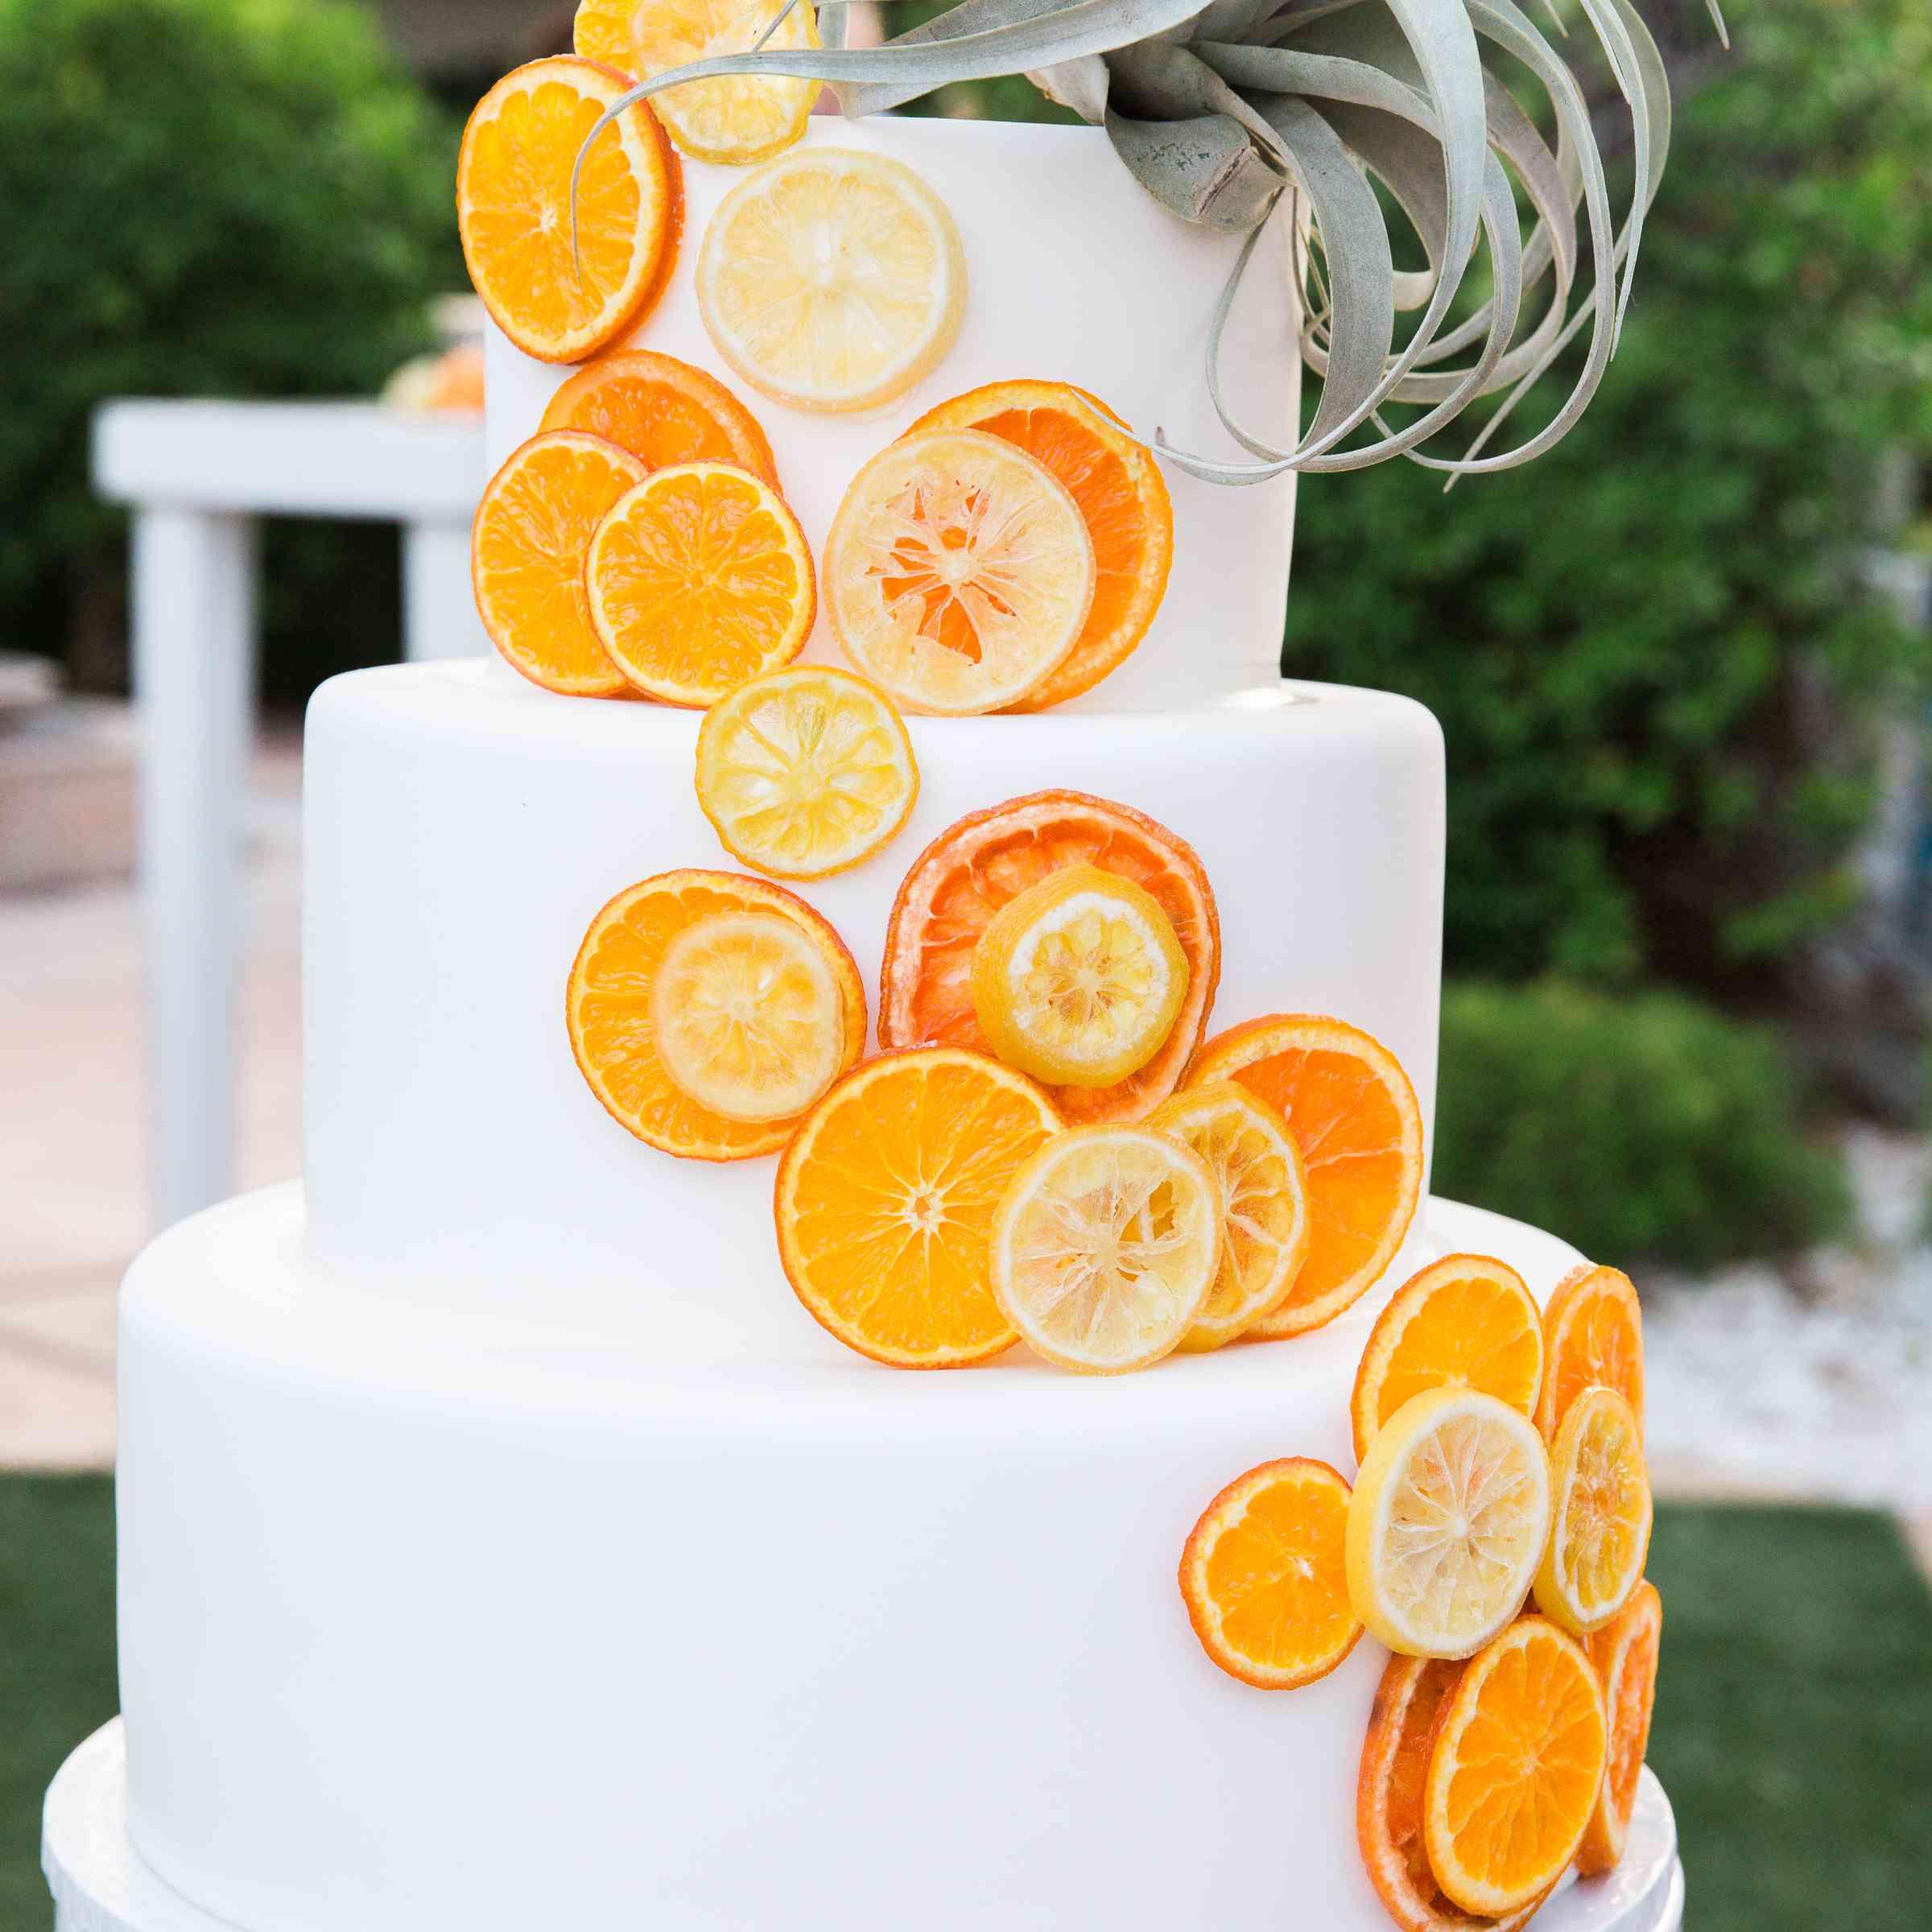 wedding cake with orange slices